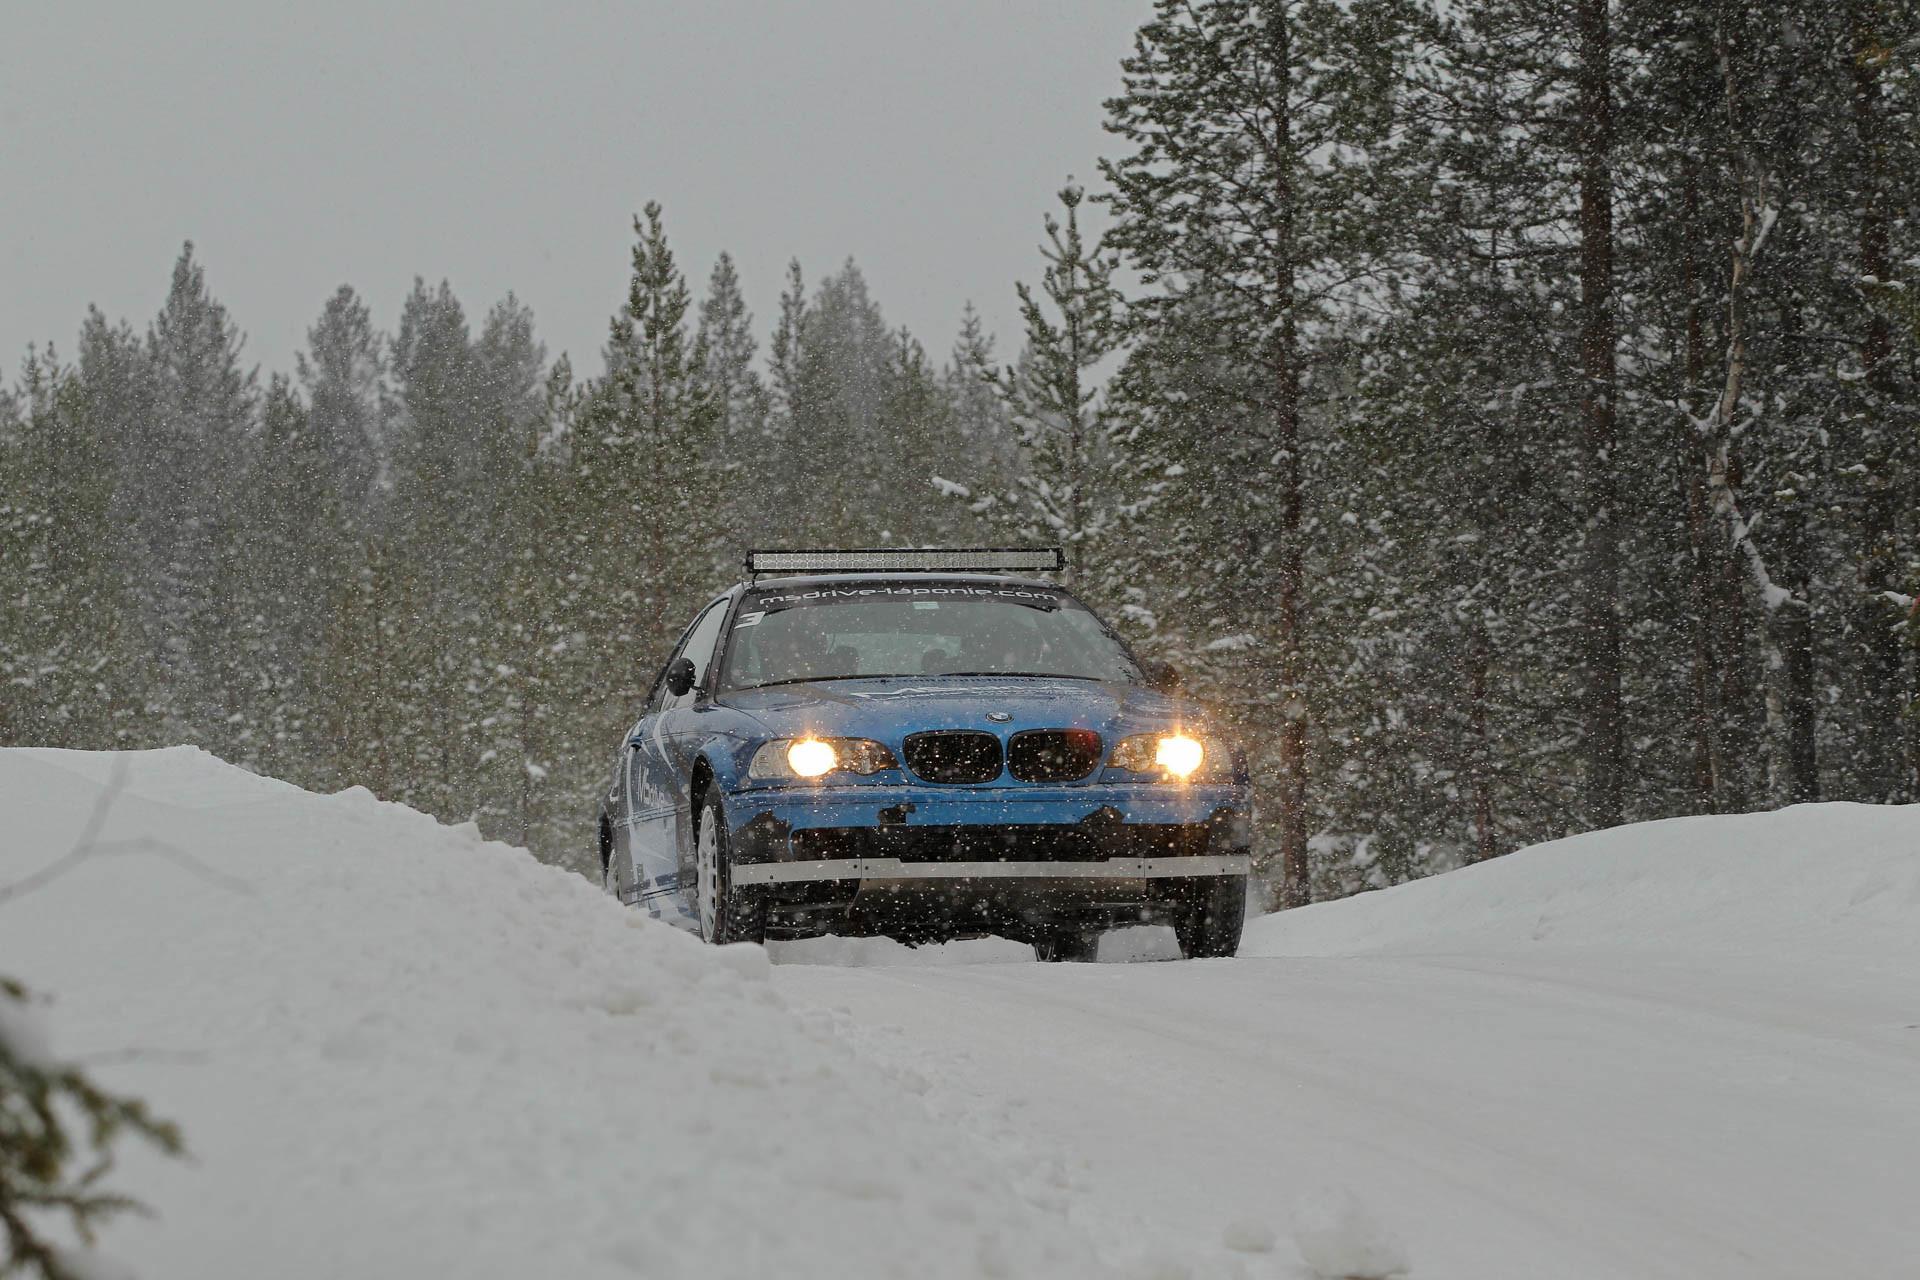 stage en laponie avec Ari Vatanen